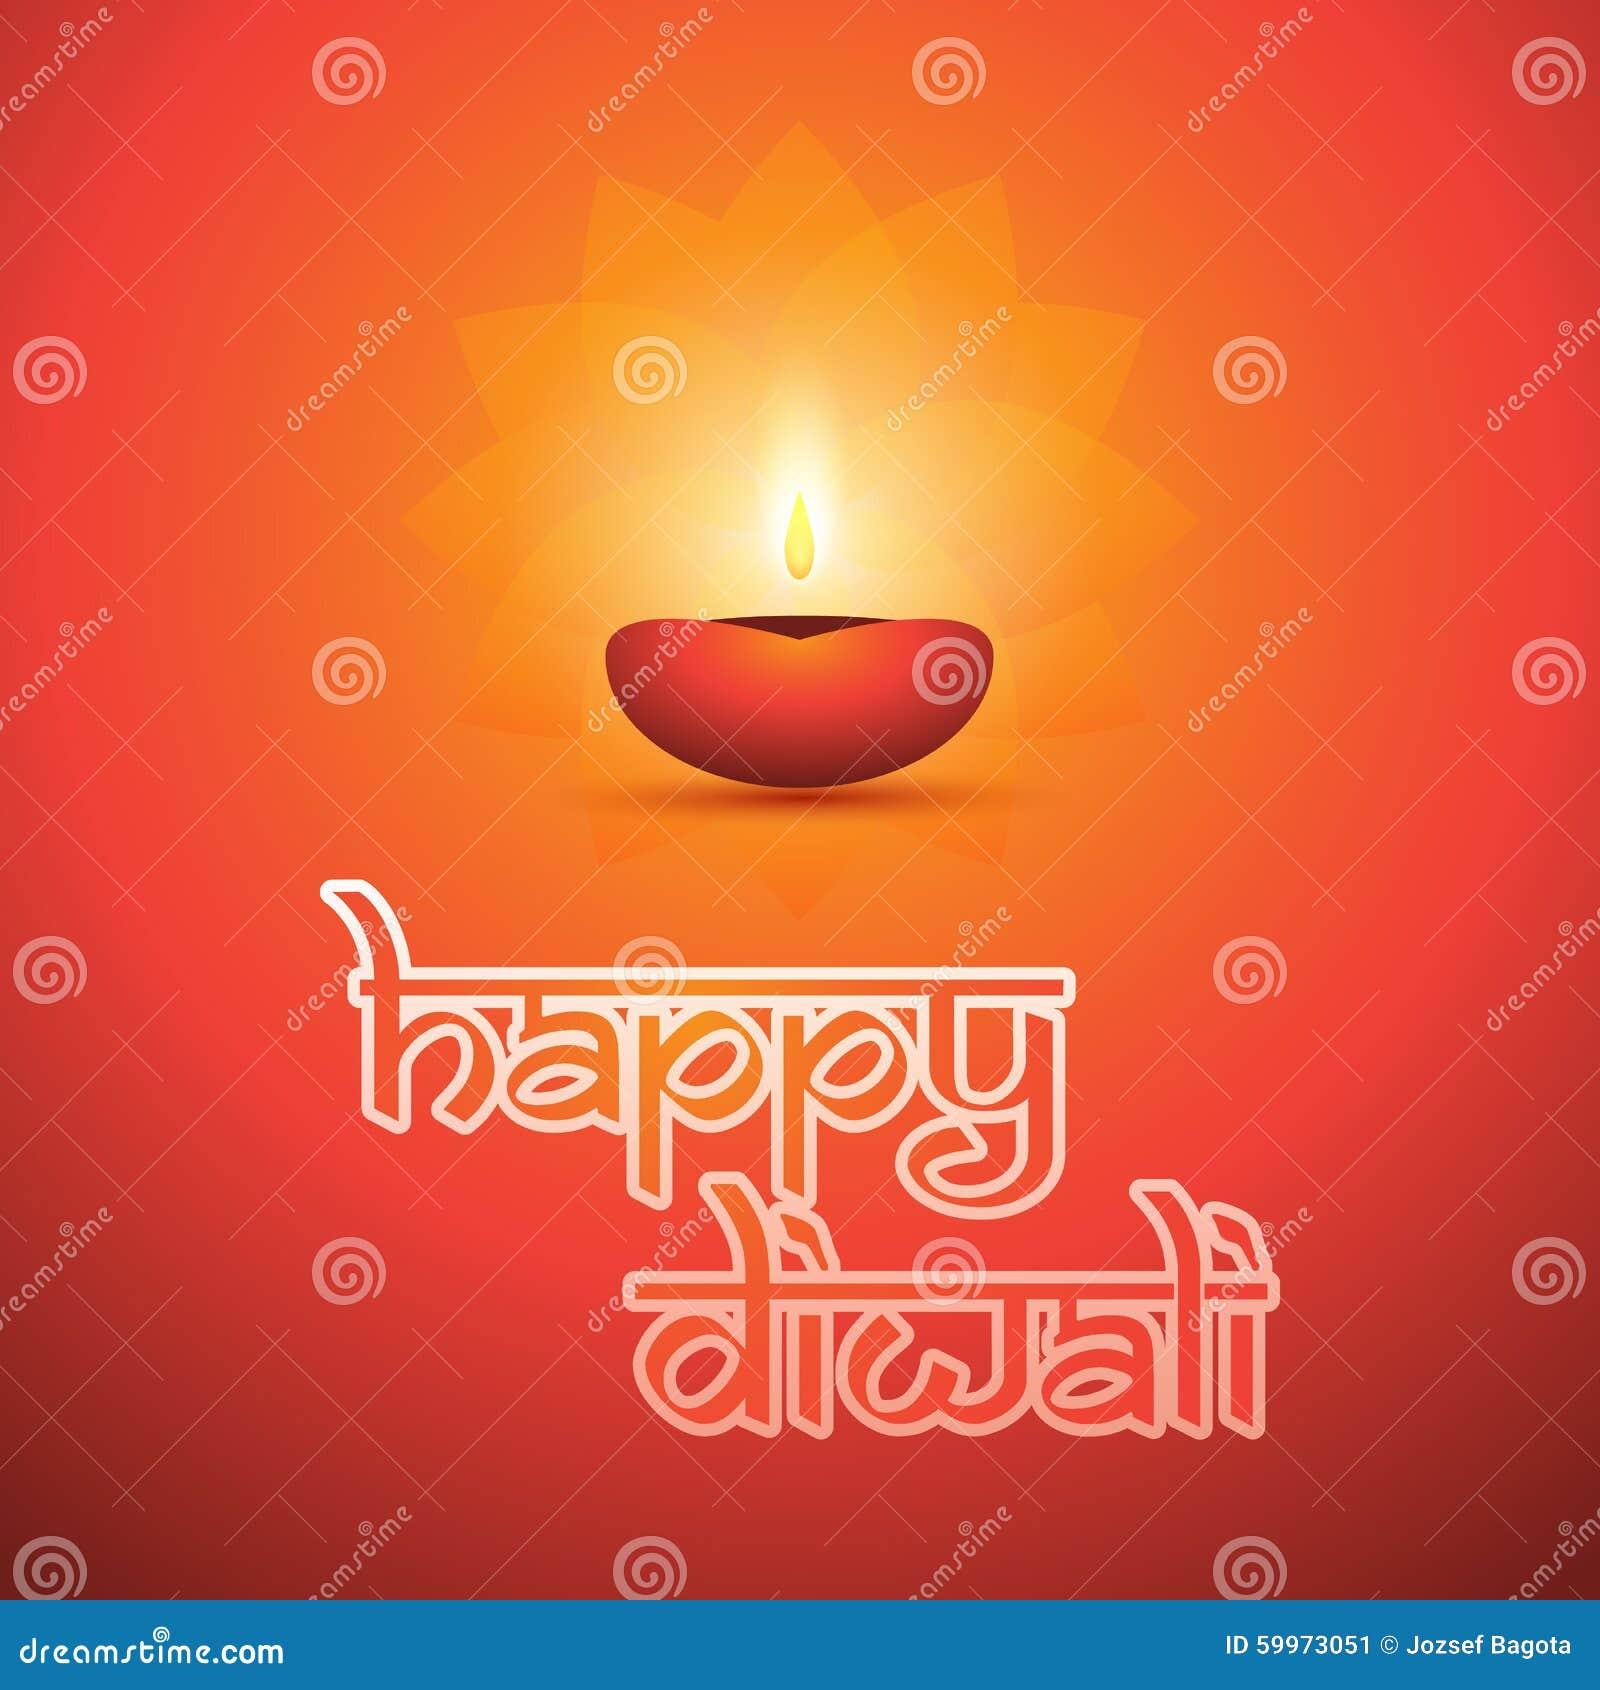 Diwali Greeting Editable Card Gallery Greetings Card Design Simple